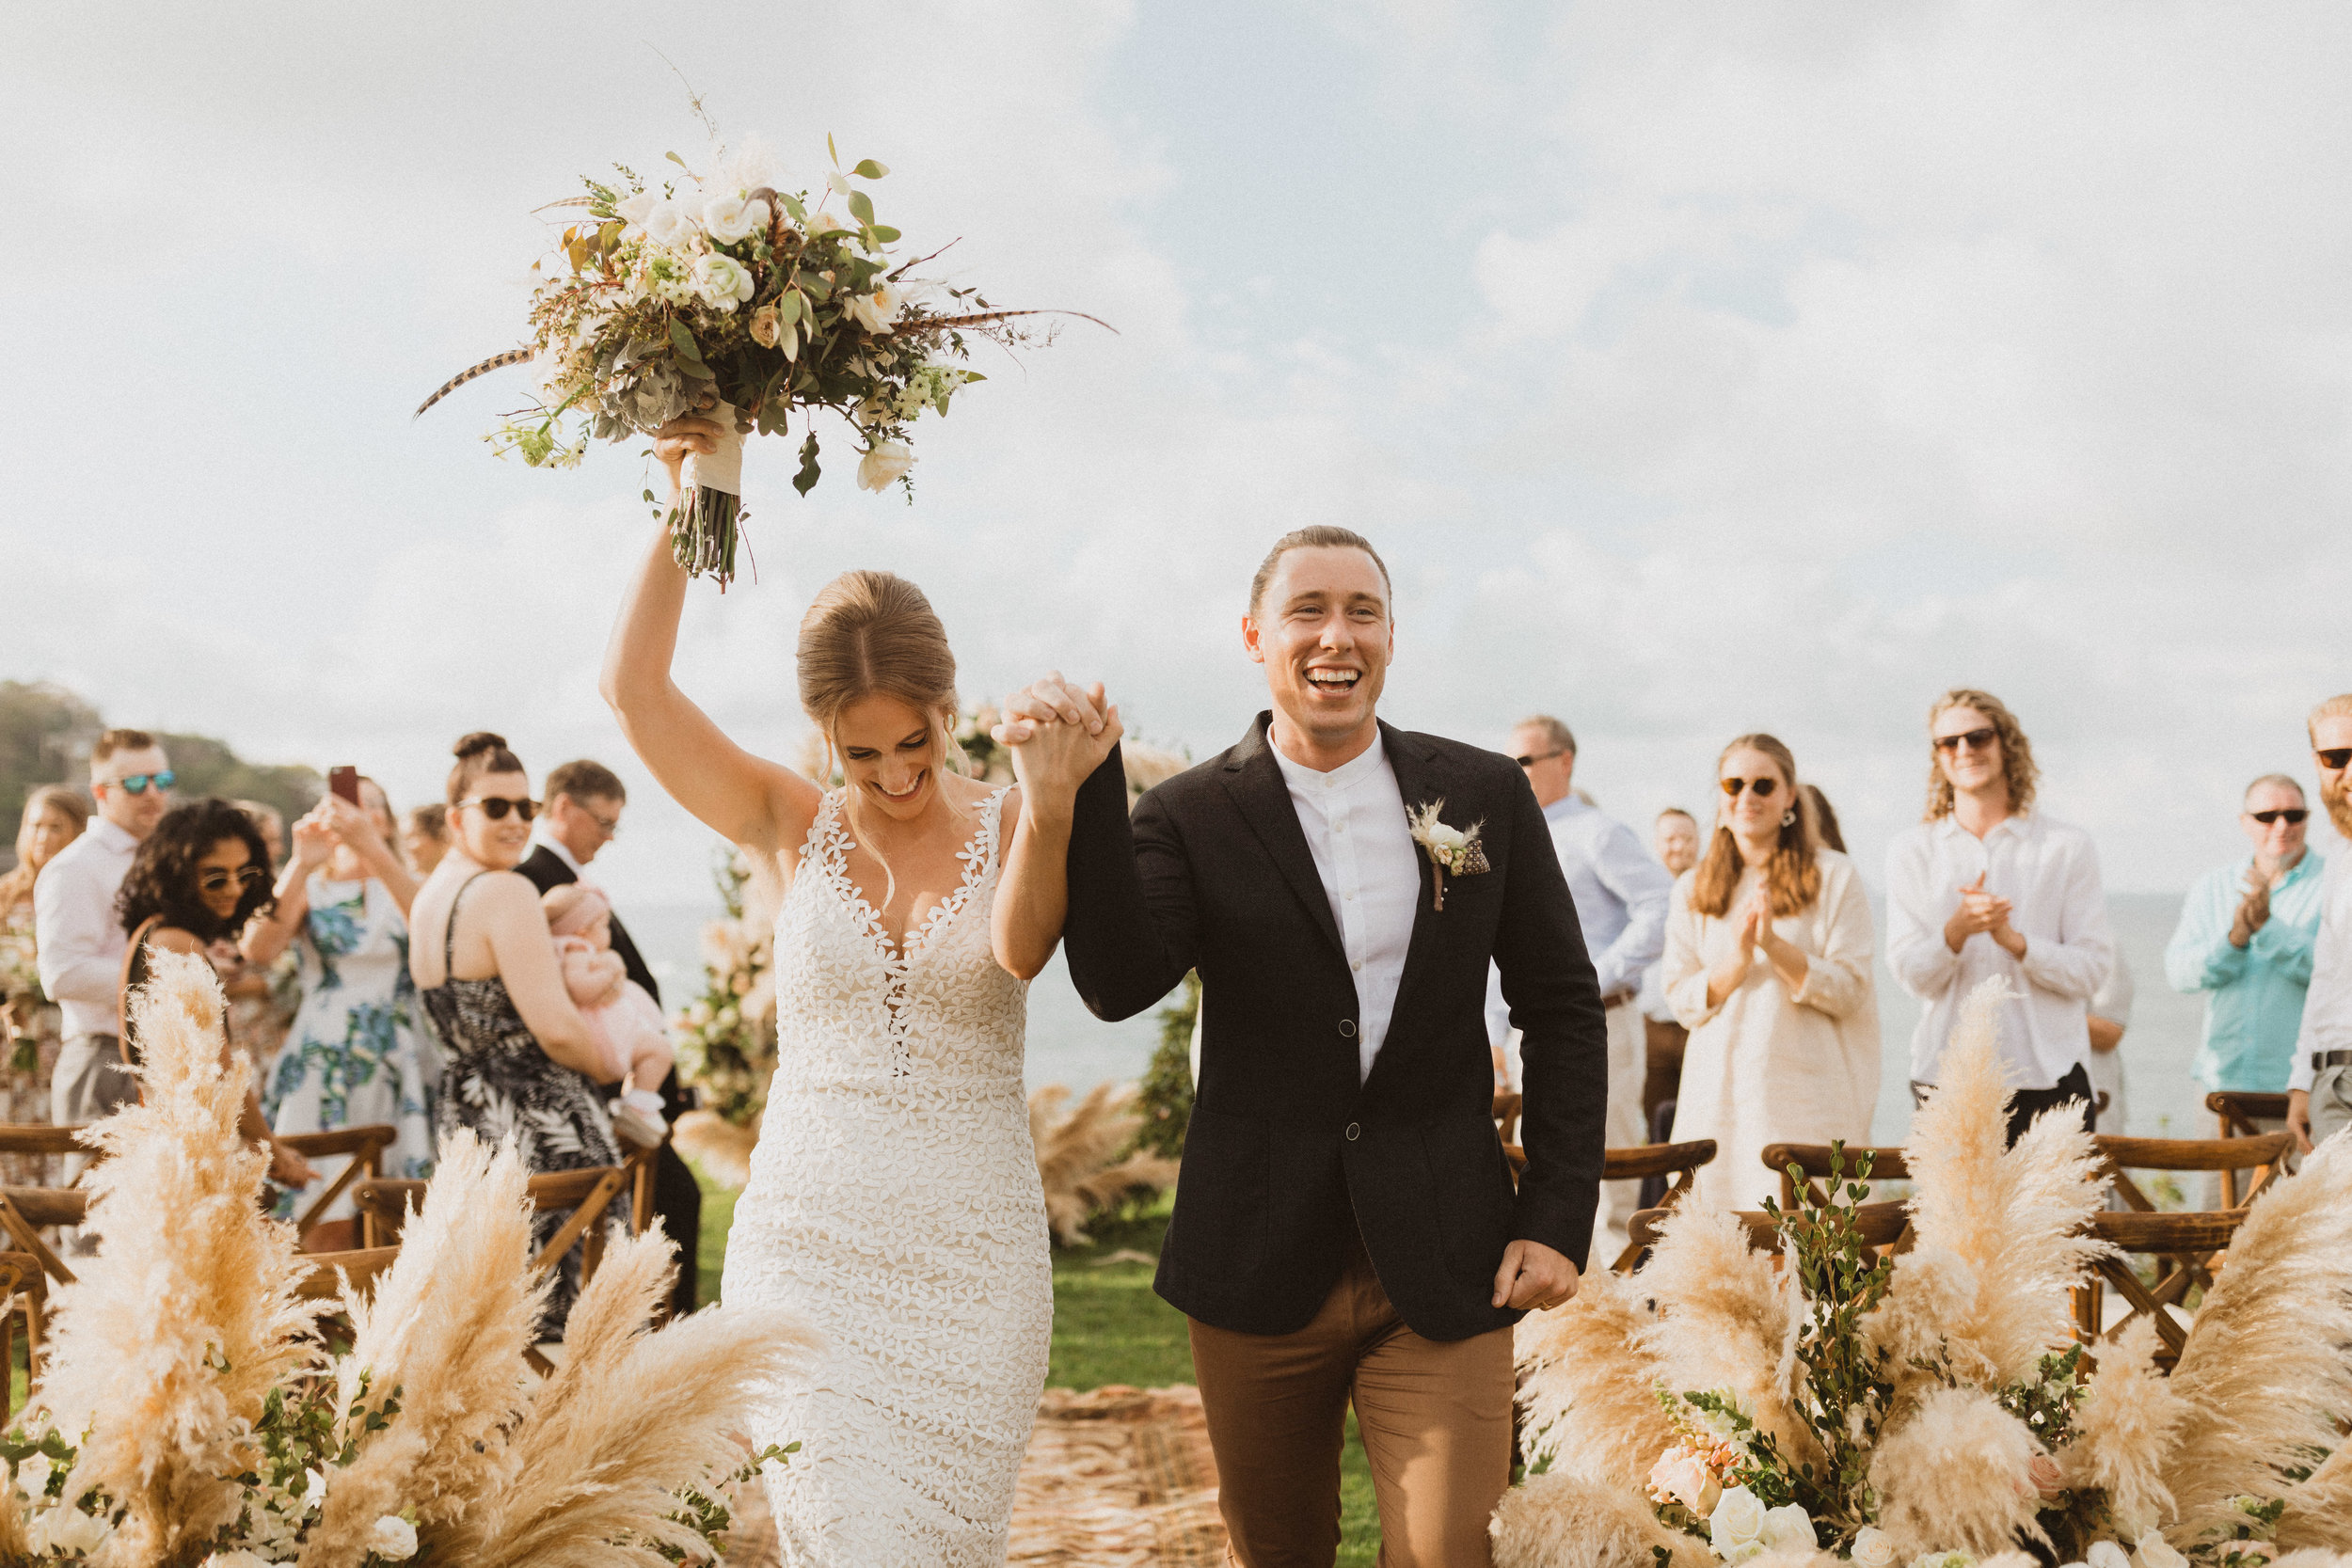 the-mclachlans-sayulita-mexico-wedding-photographers-jenna-lachlan-57.jpg